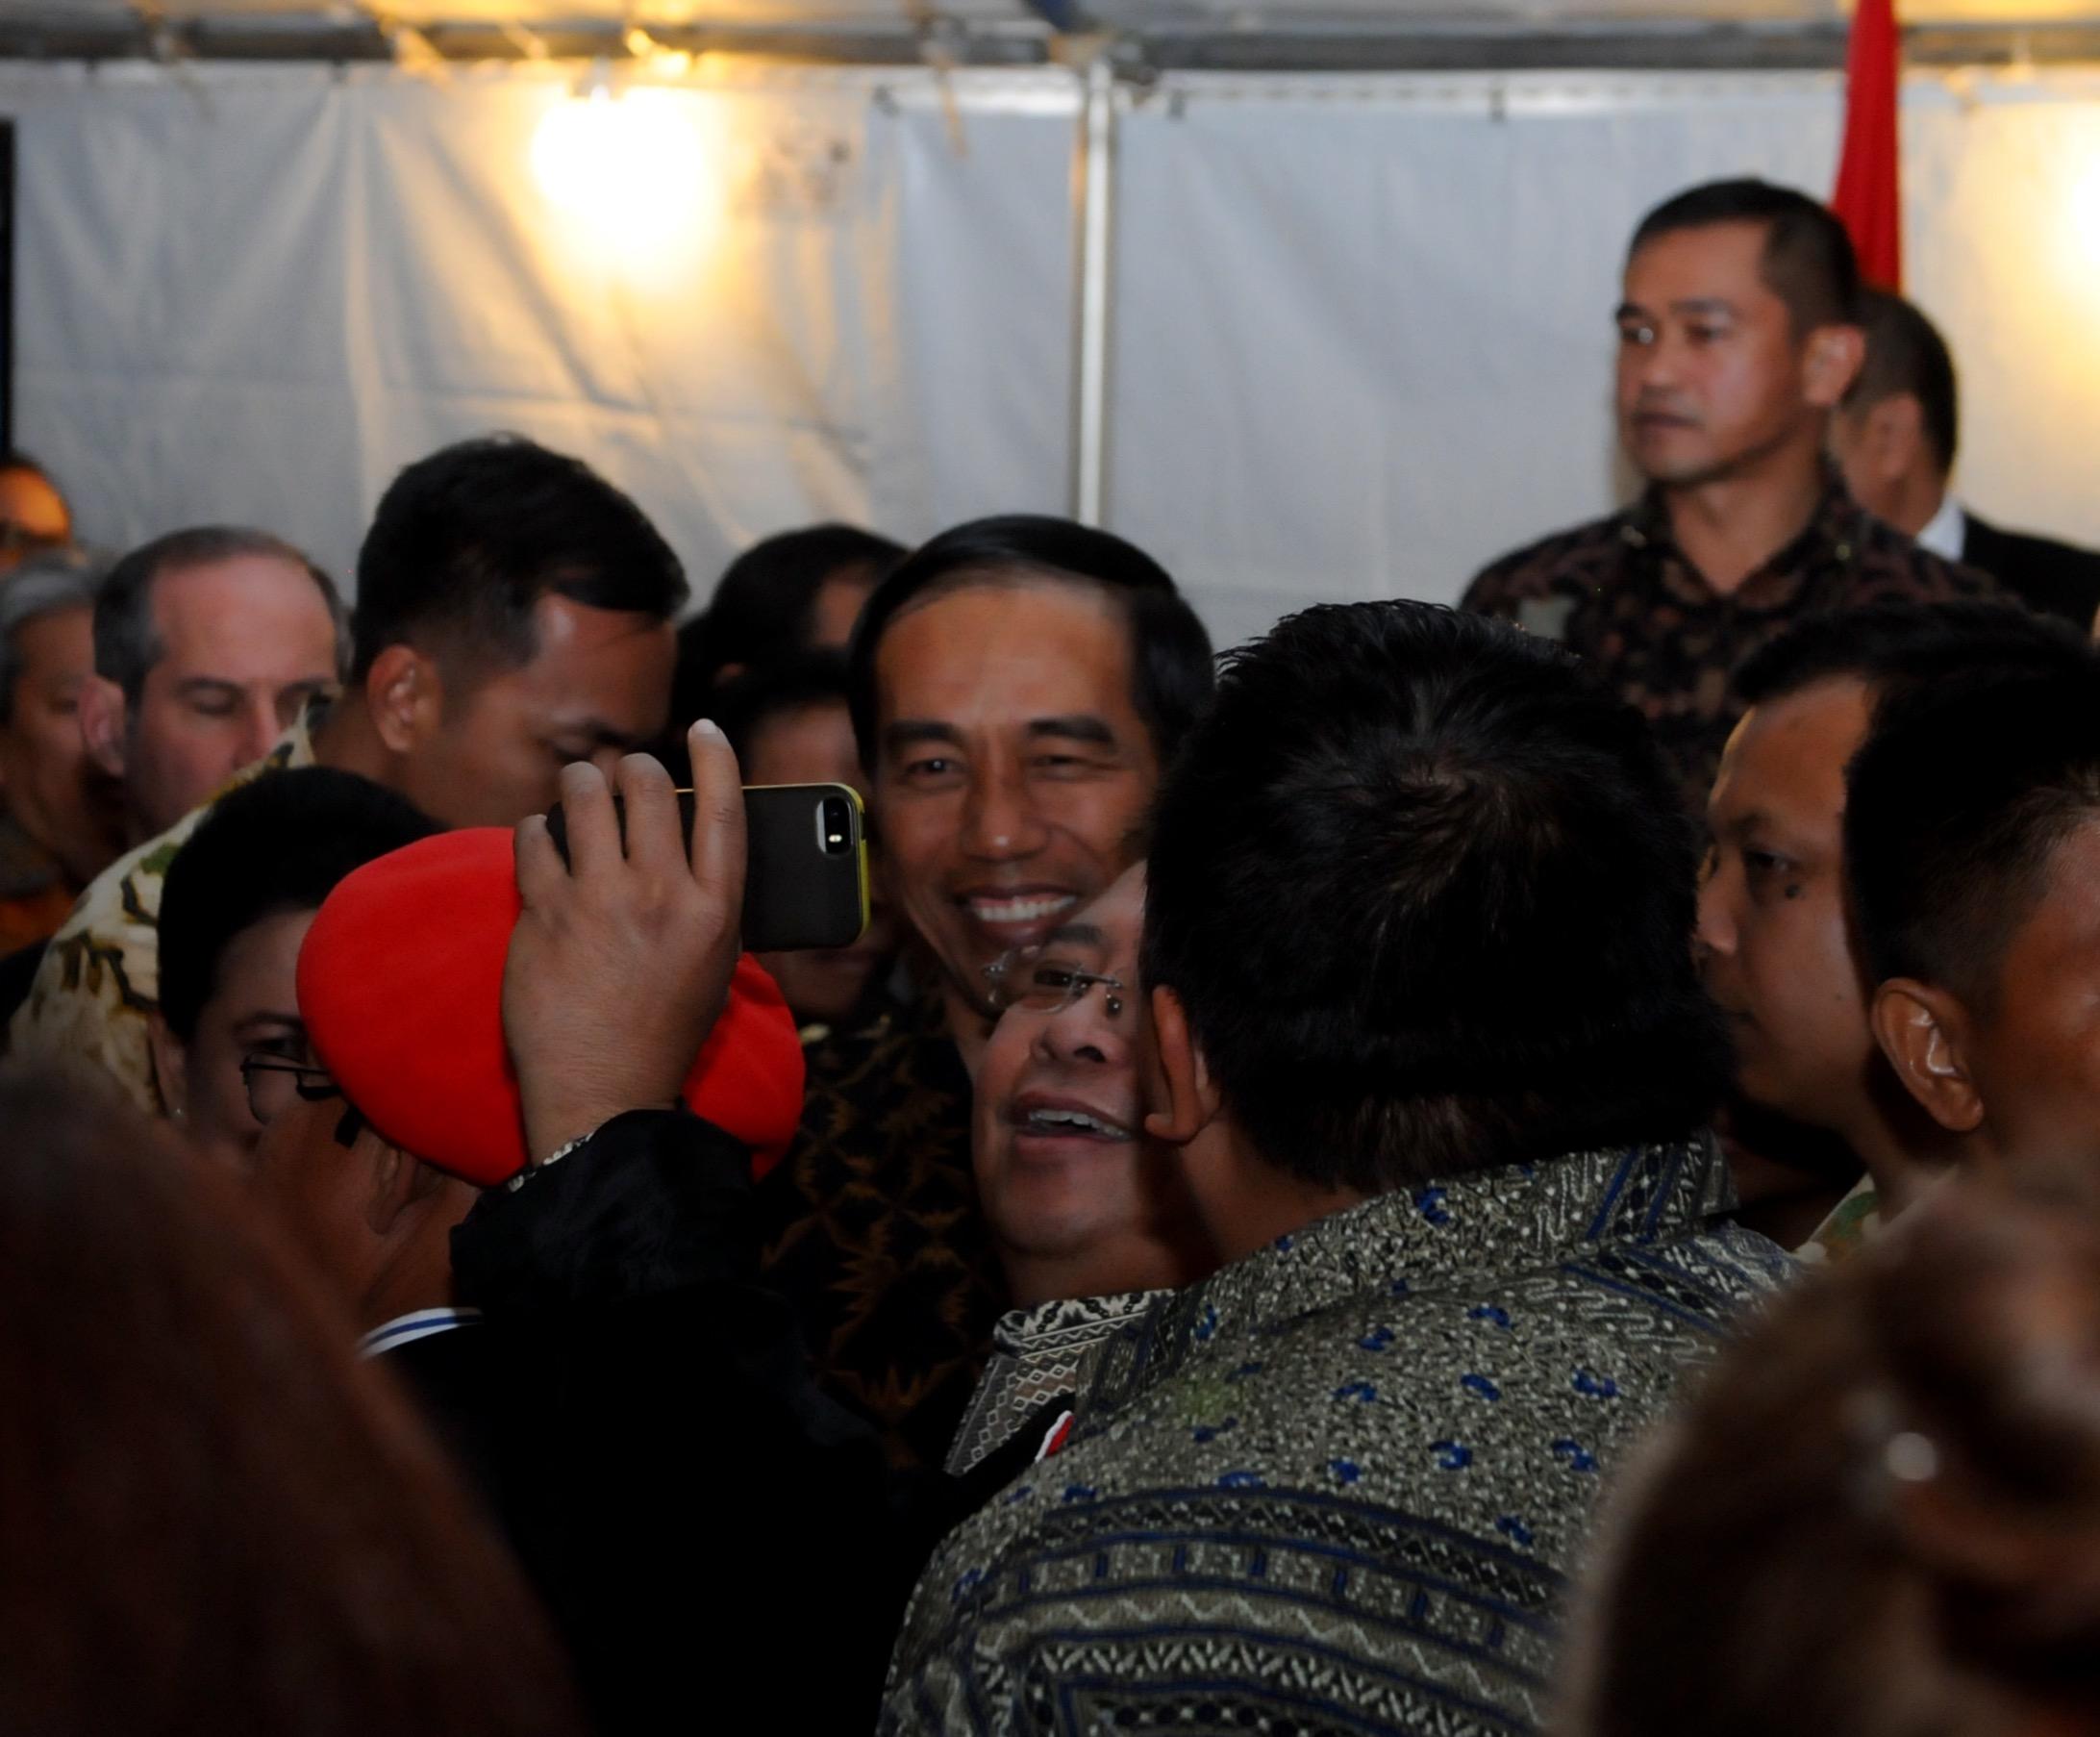 Warga Indonesia di AS sangat antusias menyambut kunjungan Presiden Jokowi. Mereka tak ragu untuk berebut selfi, di Wisma Tilden, Washington DC, Minggu (21/10) sore